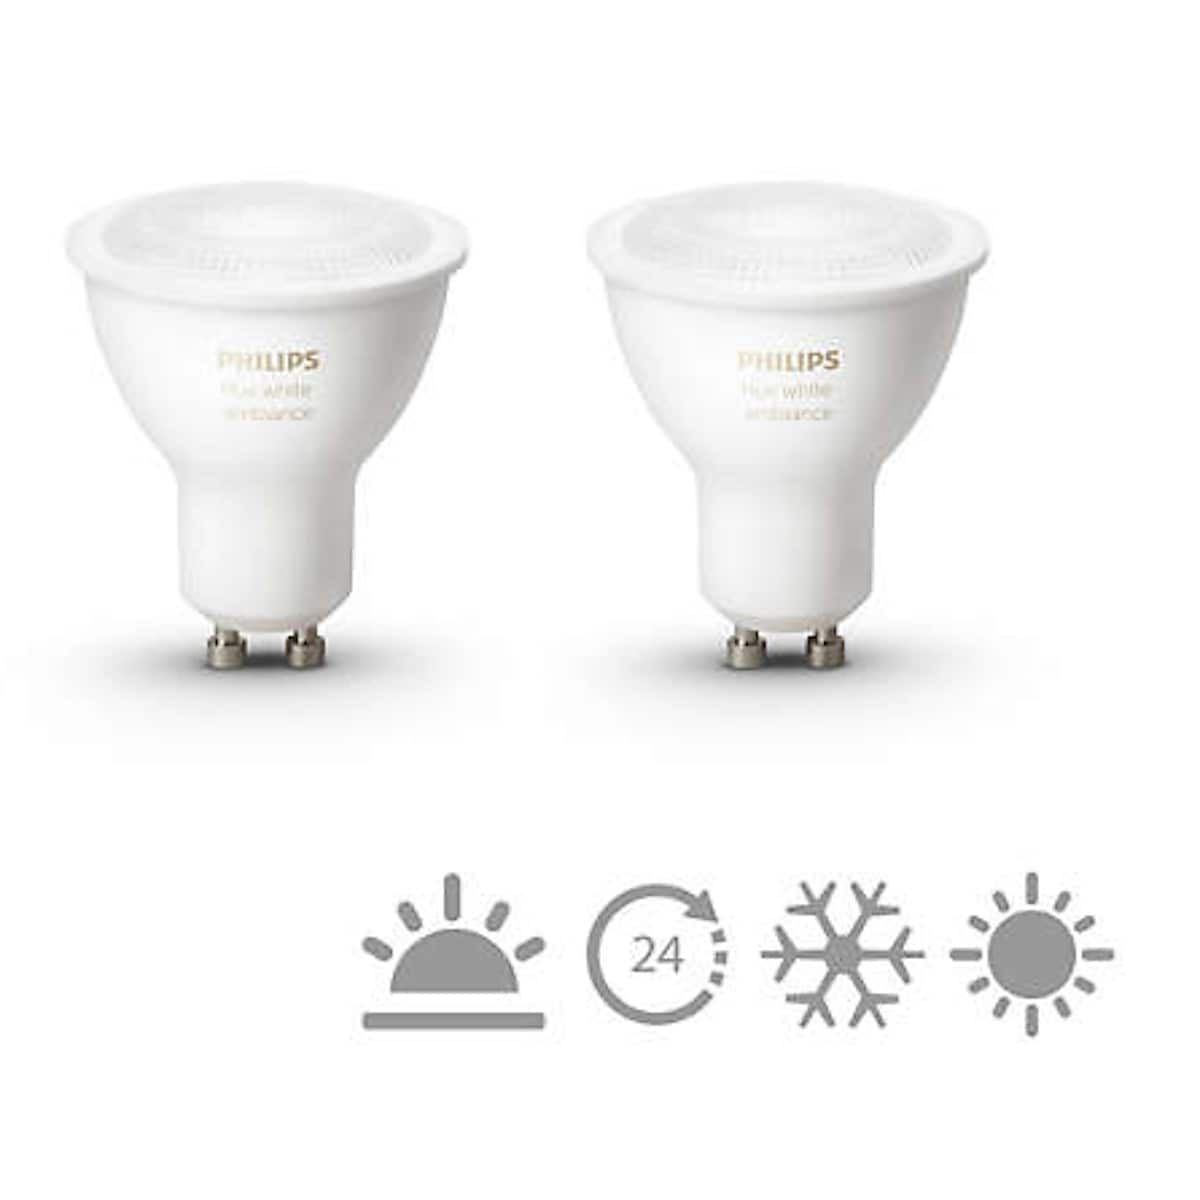 Philips Hue Ambiance LED-lyspære 5,5 W GU10, 2-pack